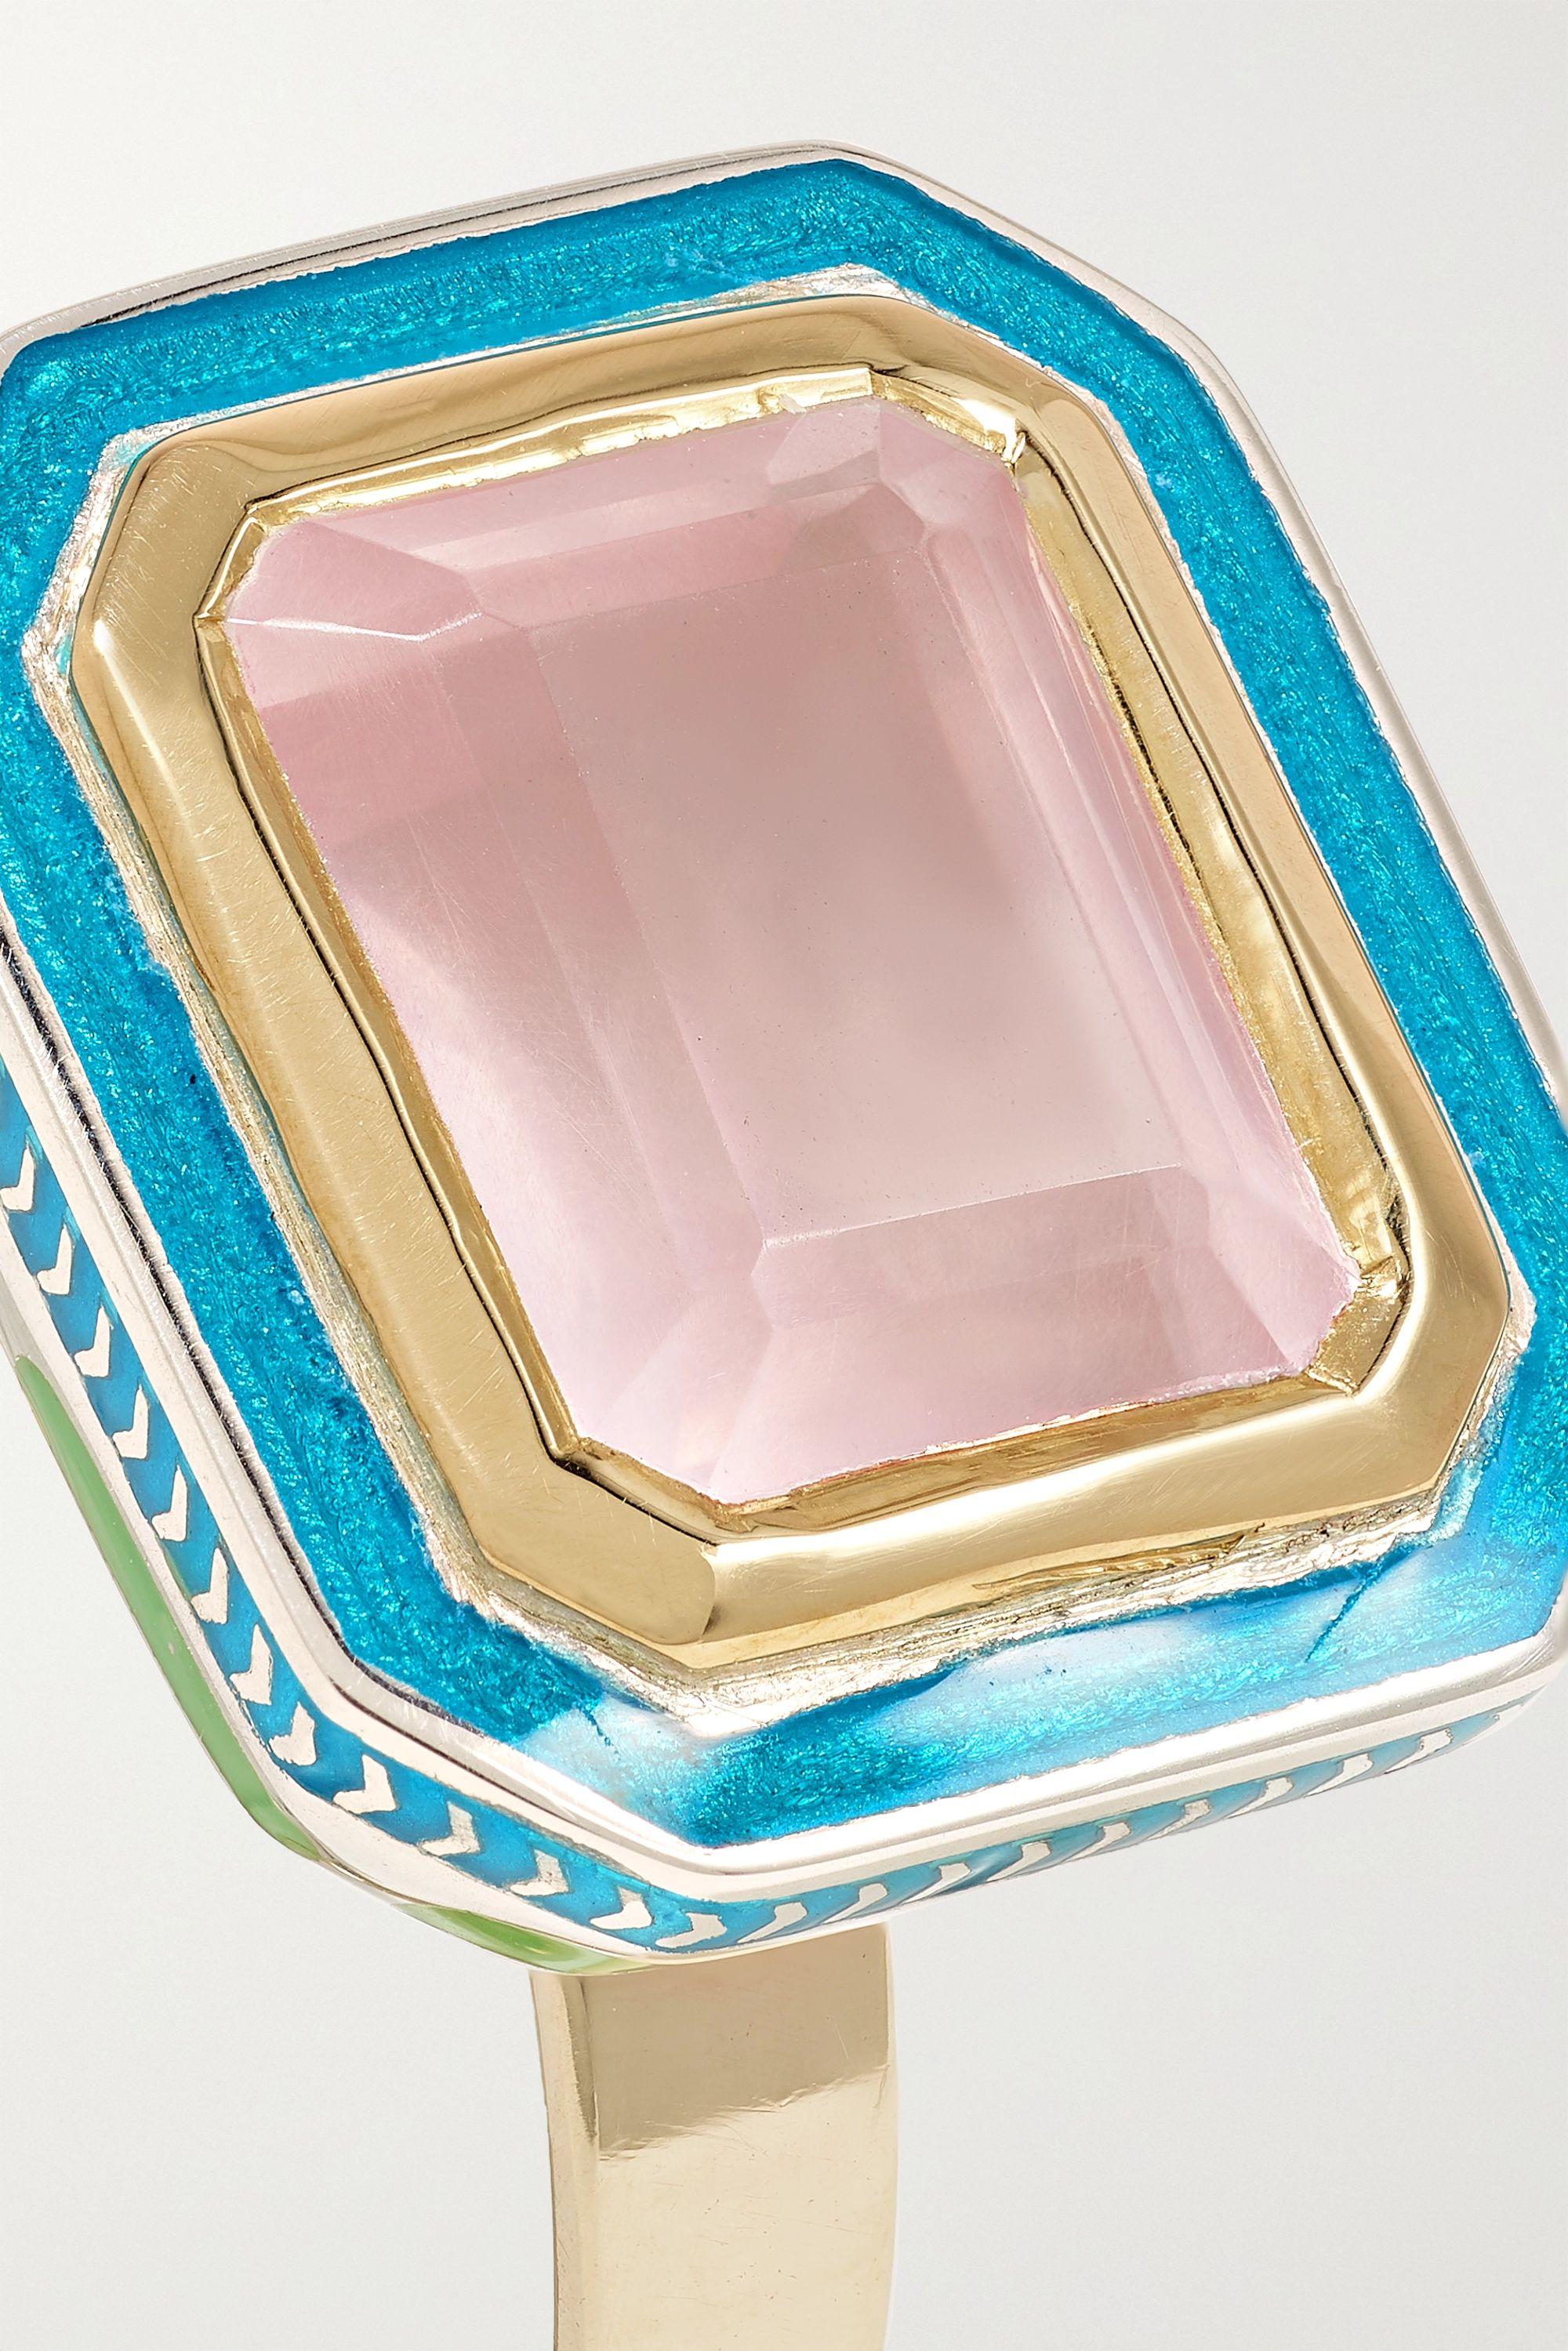 Alice Cicolini 14-karat gold, sterling silver, quartz and enamel ring